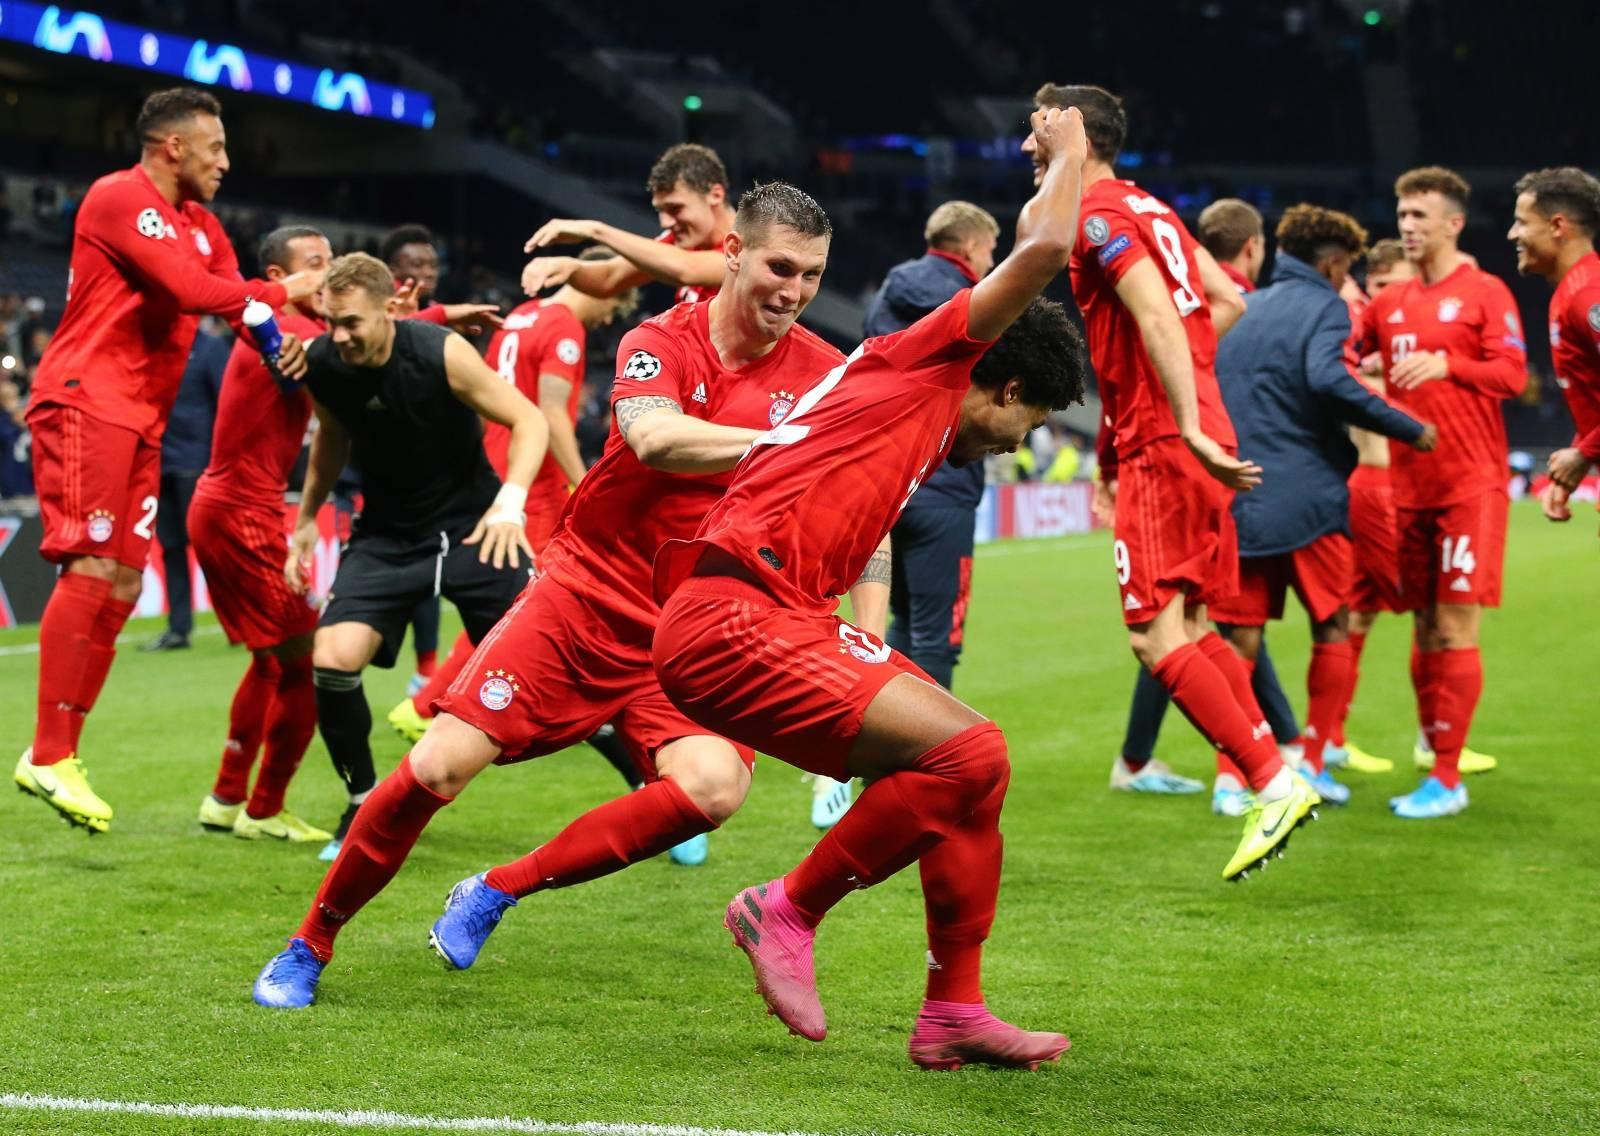 Tottenham Hotspur v Bayern Munich - UEFA Champions League - Group B - Tottenham Hotspur Stadium